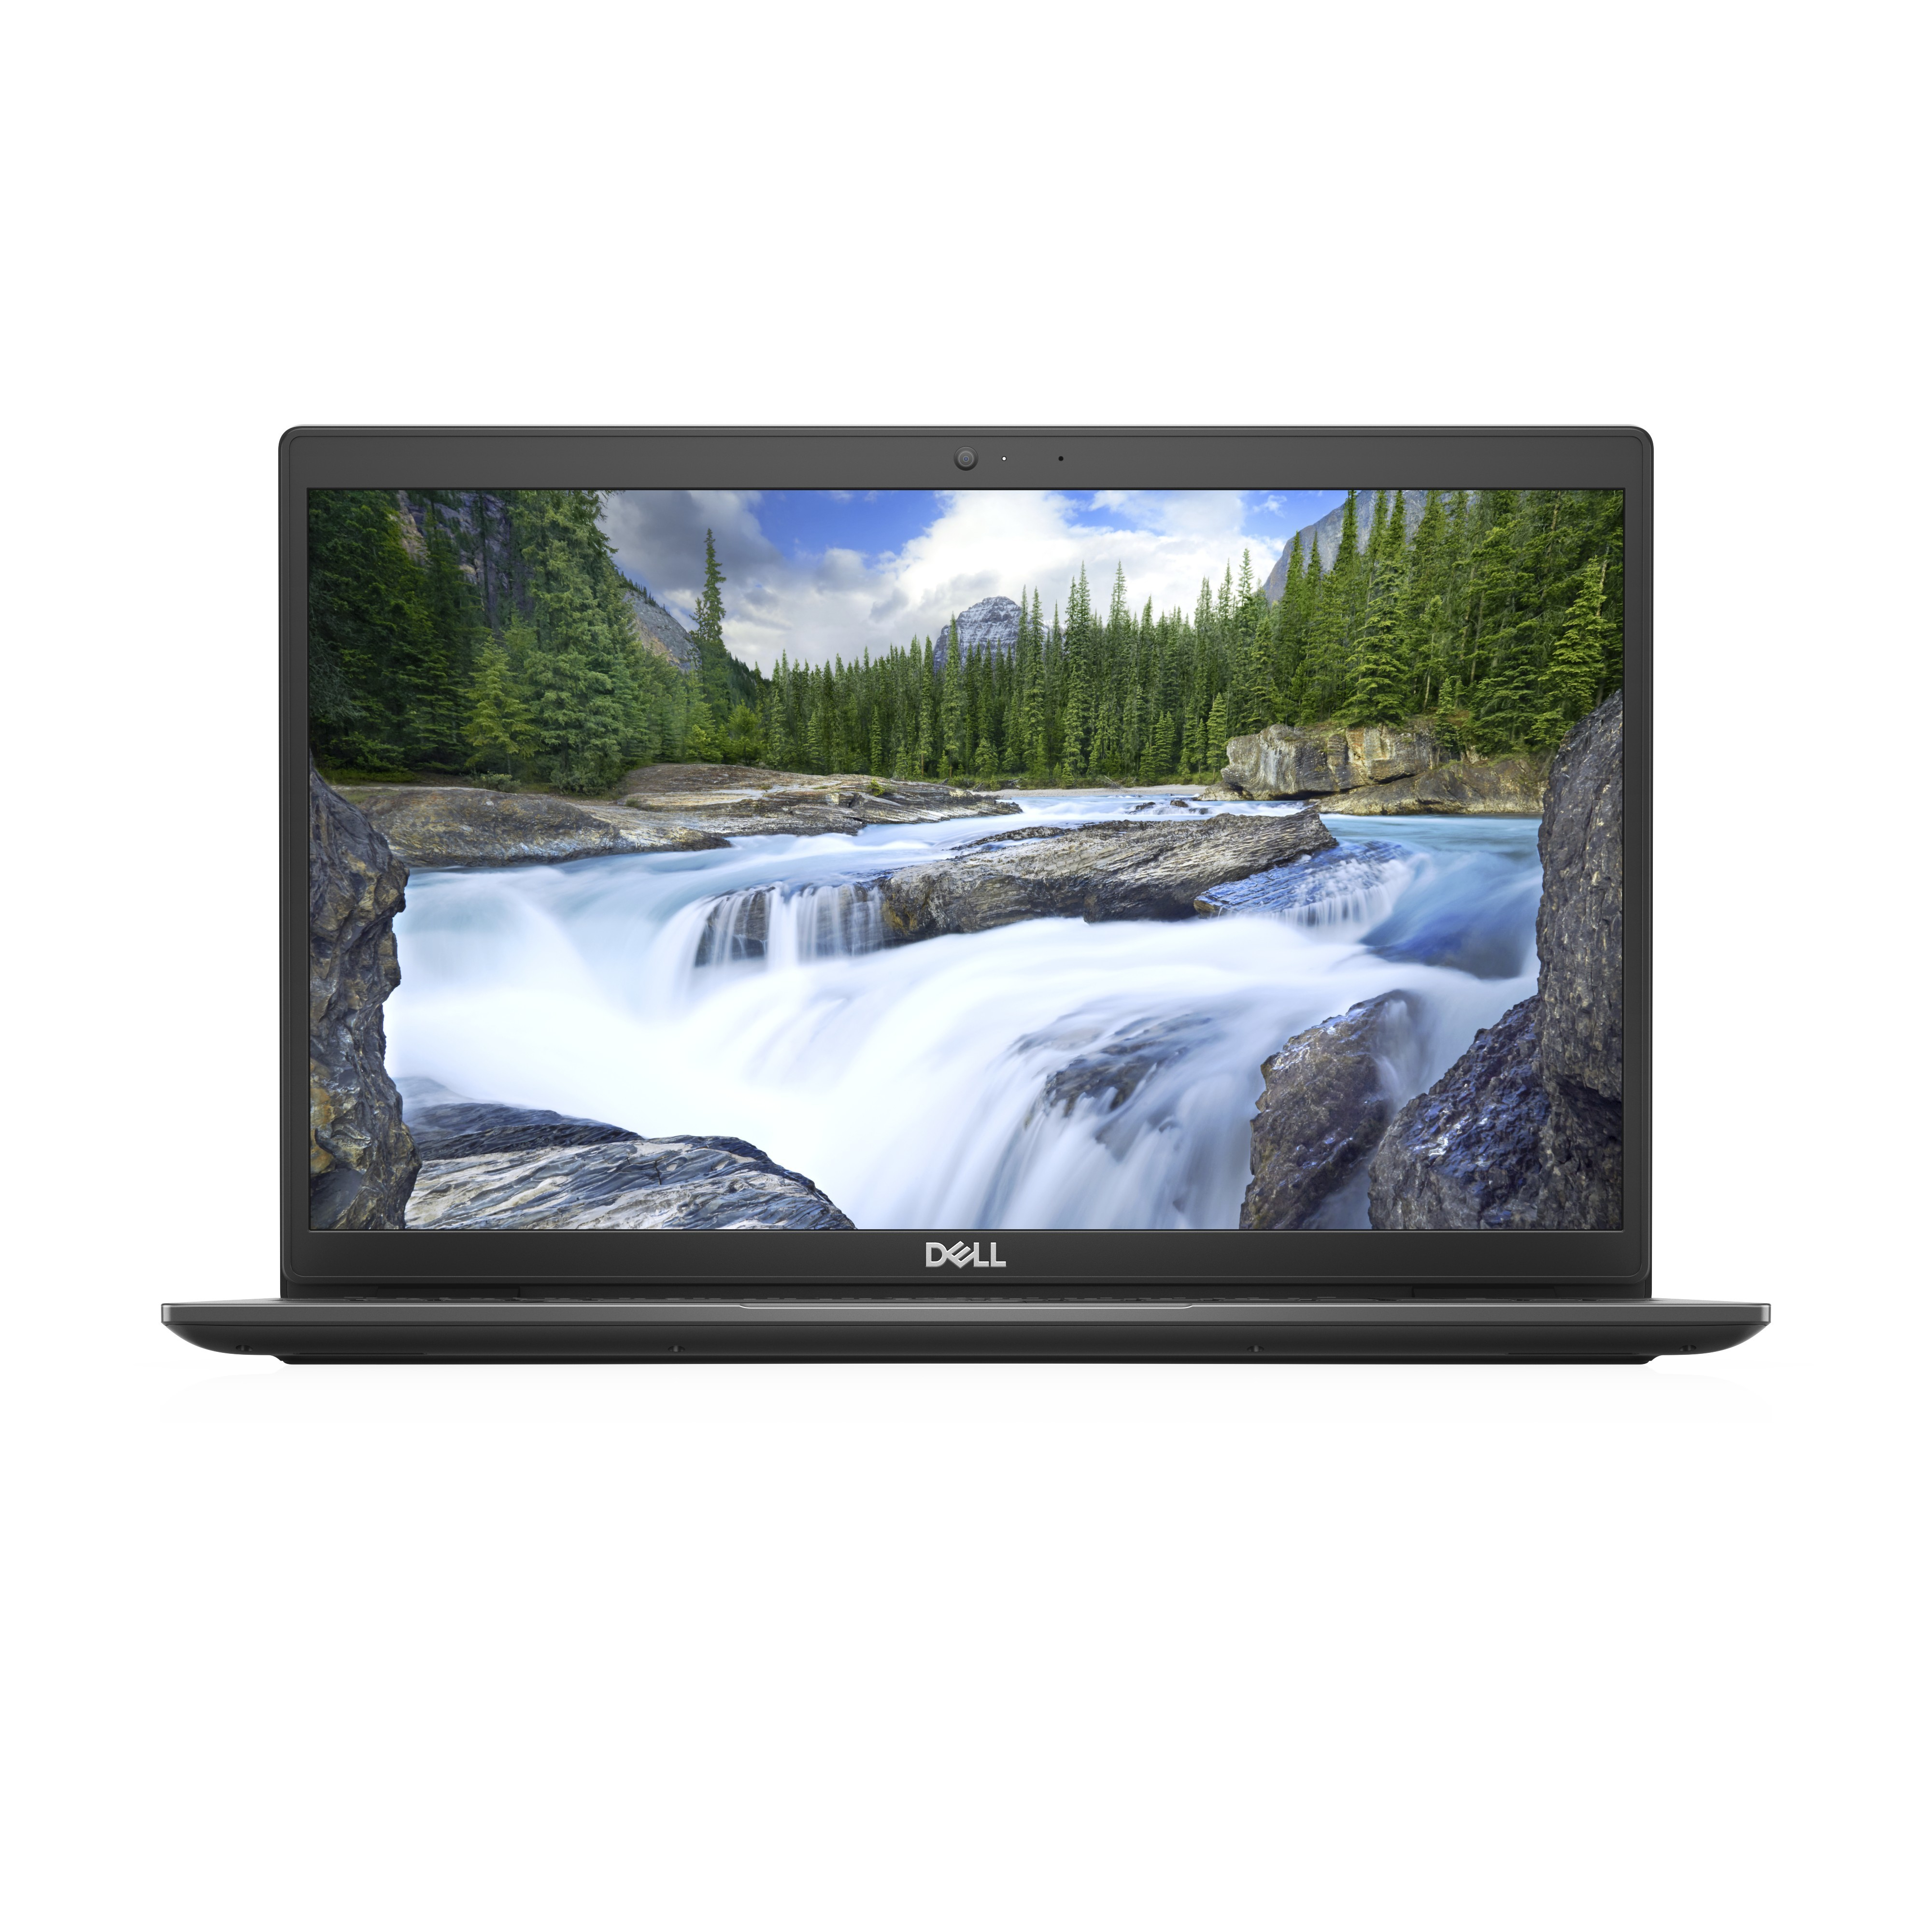 "DELL Latitude 3520 Notebook 39,6 cm (15.6"") Full HD Intel® 11de generatie Core™ i5 8 GB DDR4-SDRAM 512 GB SSD Wi-Fi 6 (802.11ax) Windows 10 Pro Grijs"